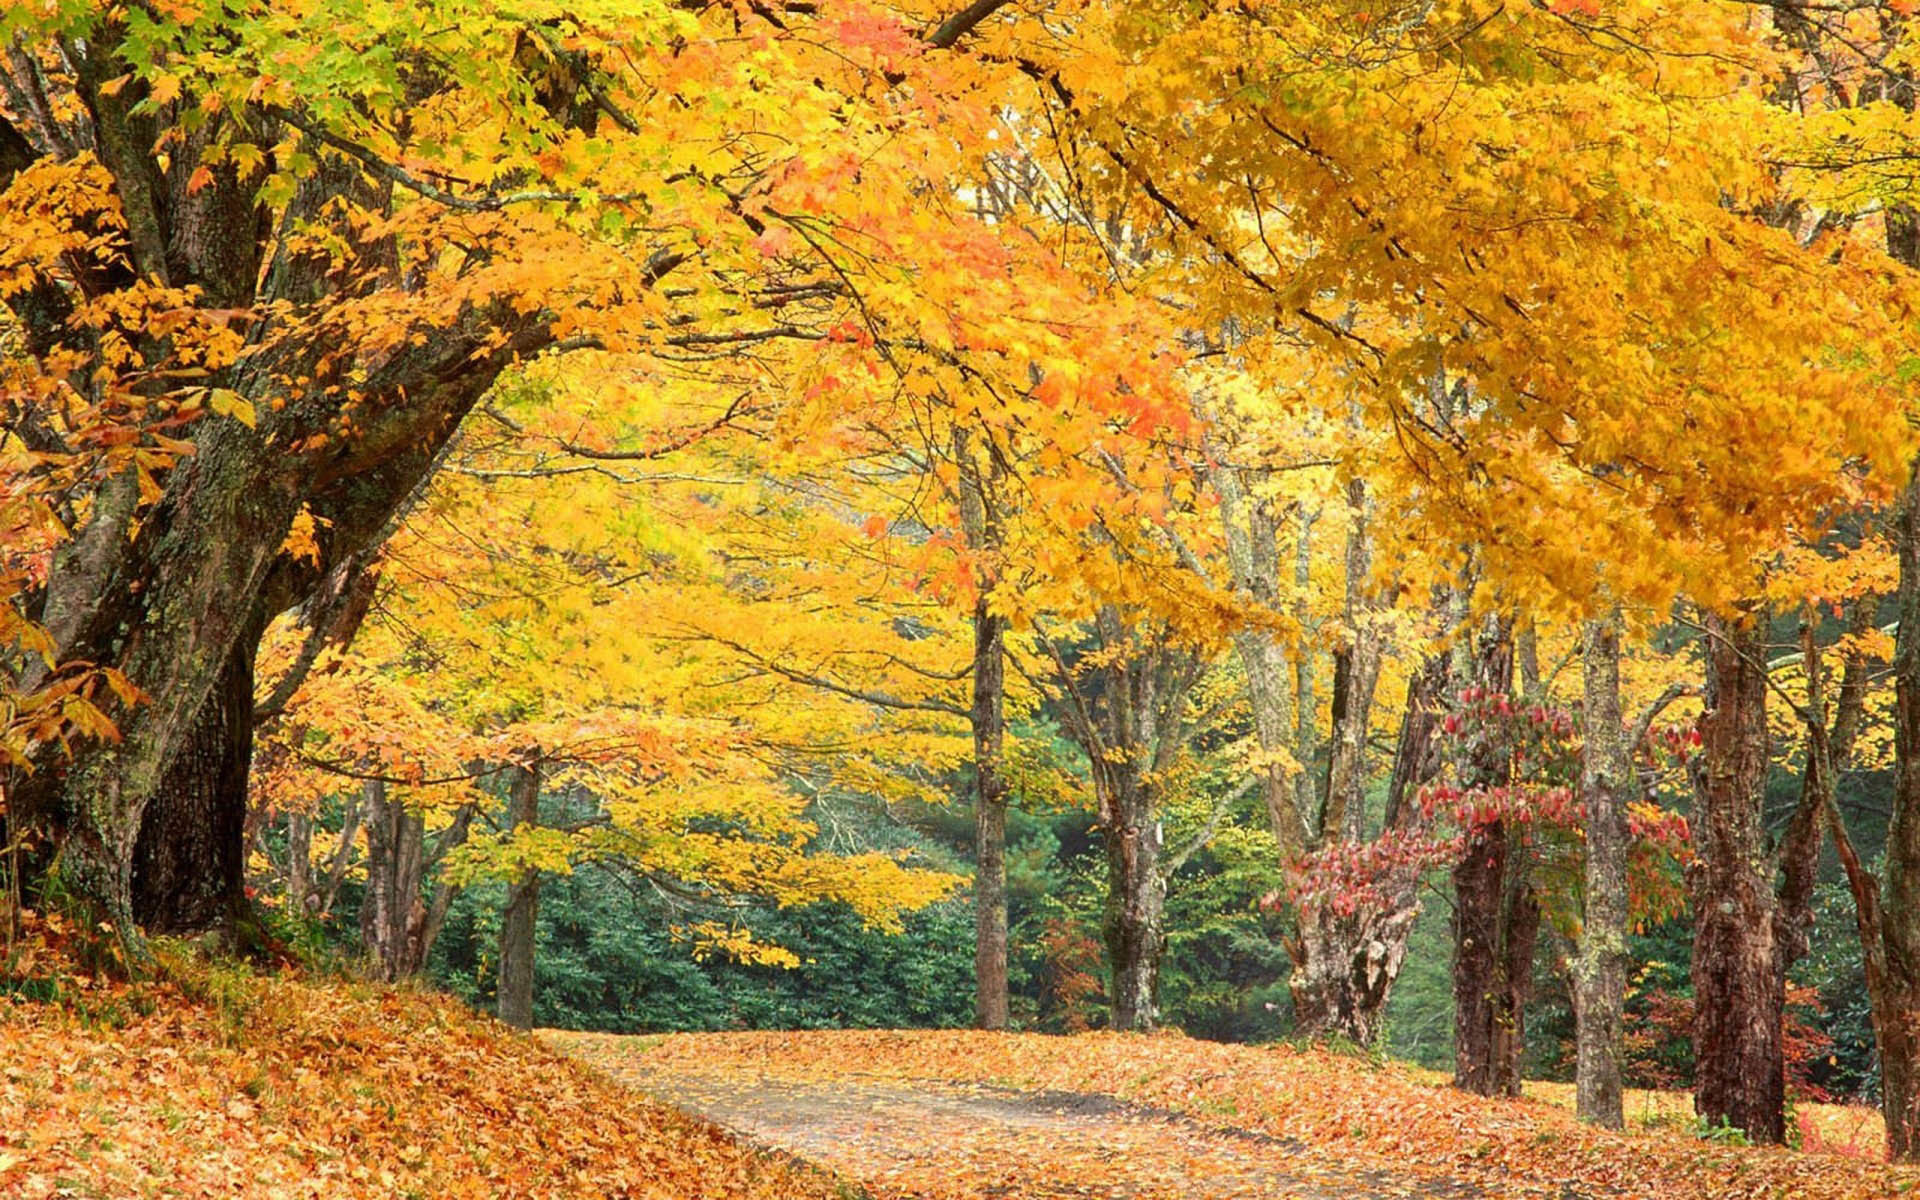 Autumn Scenes Wallpapers, Wallpapers & Pictures .